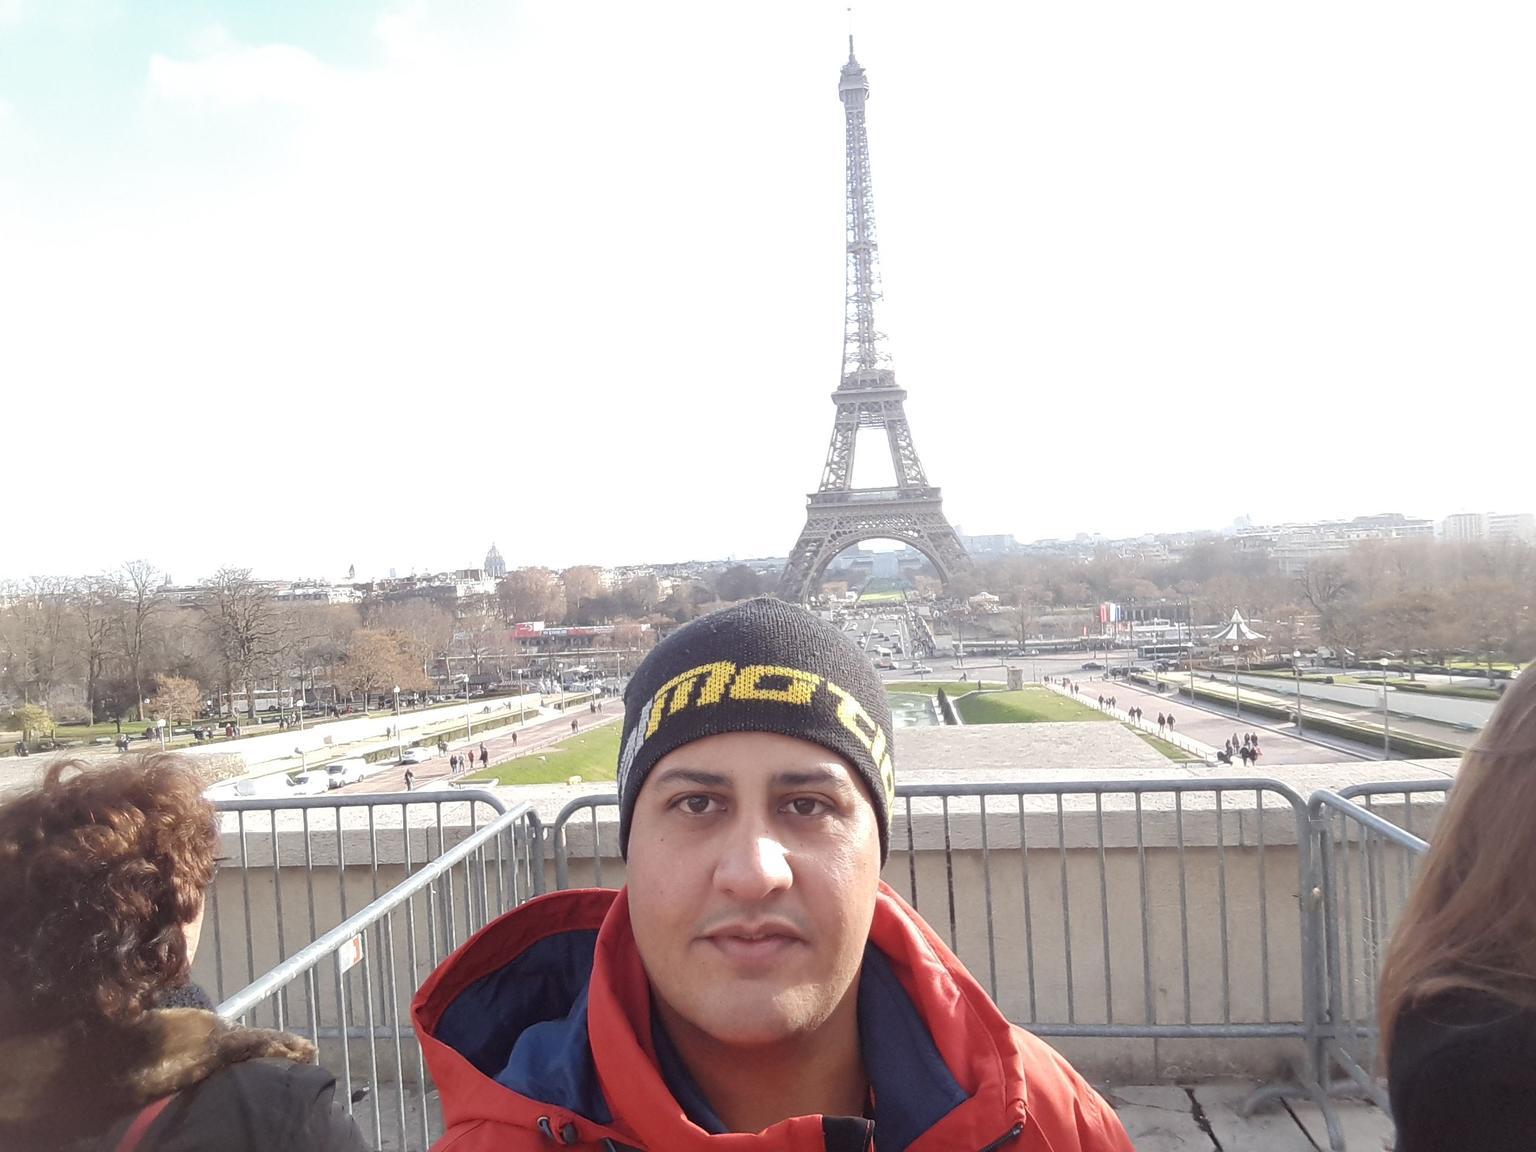 MAIS FOTOS, Paris Passlib' (official city-pass) : cruise, museums and unlimited transport